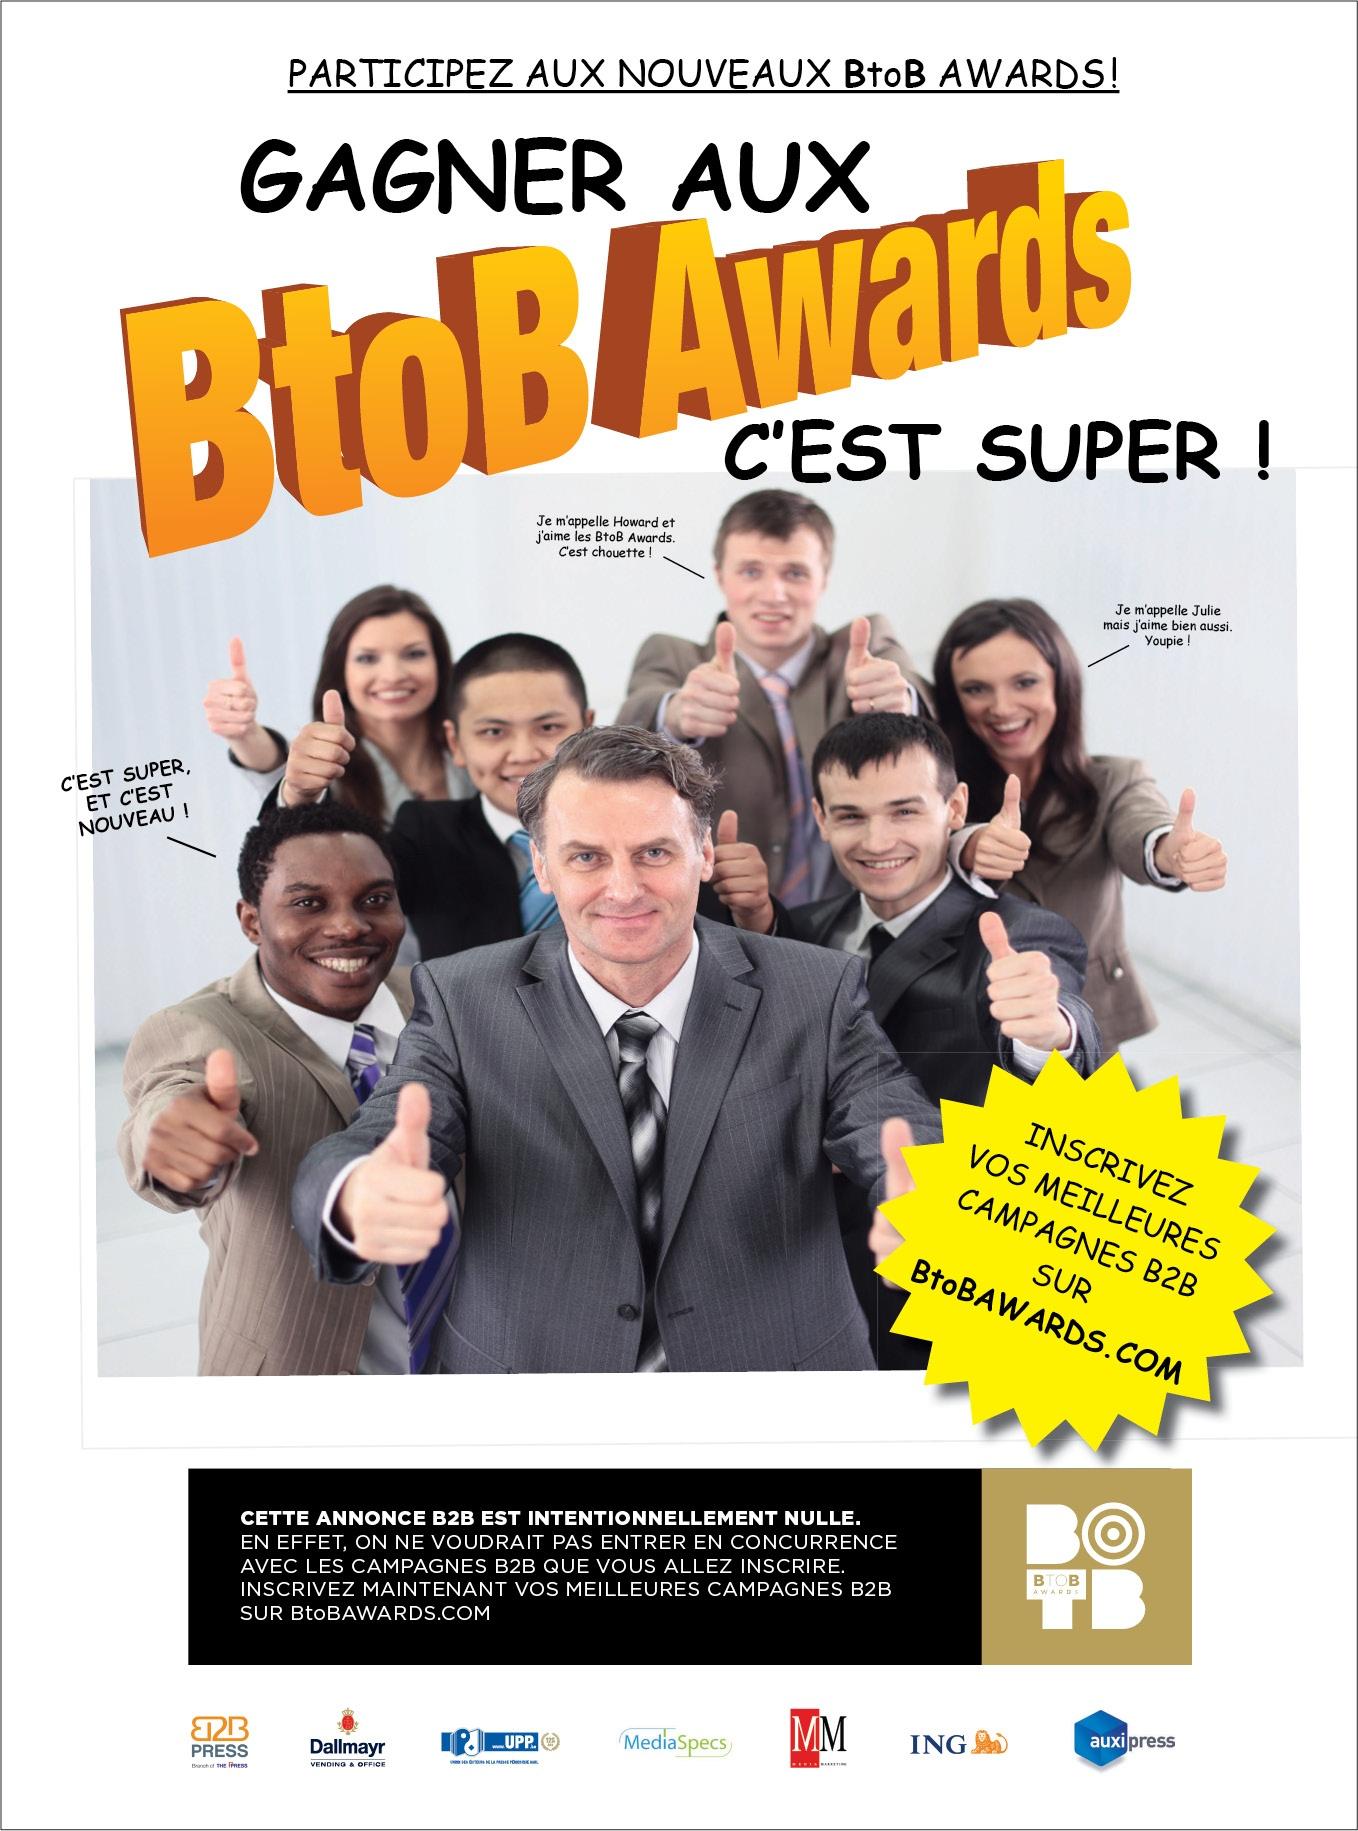 BtoB_Awards_ad_230x310_FR